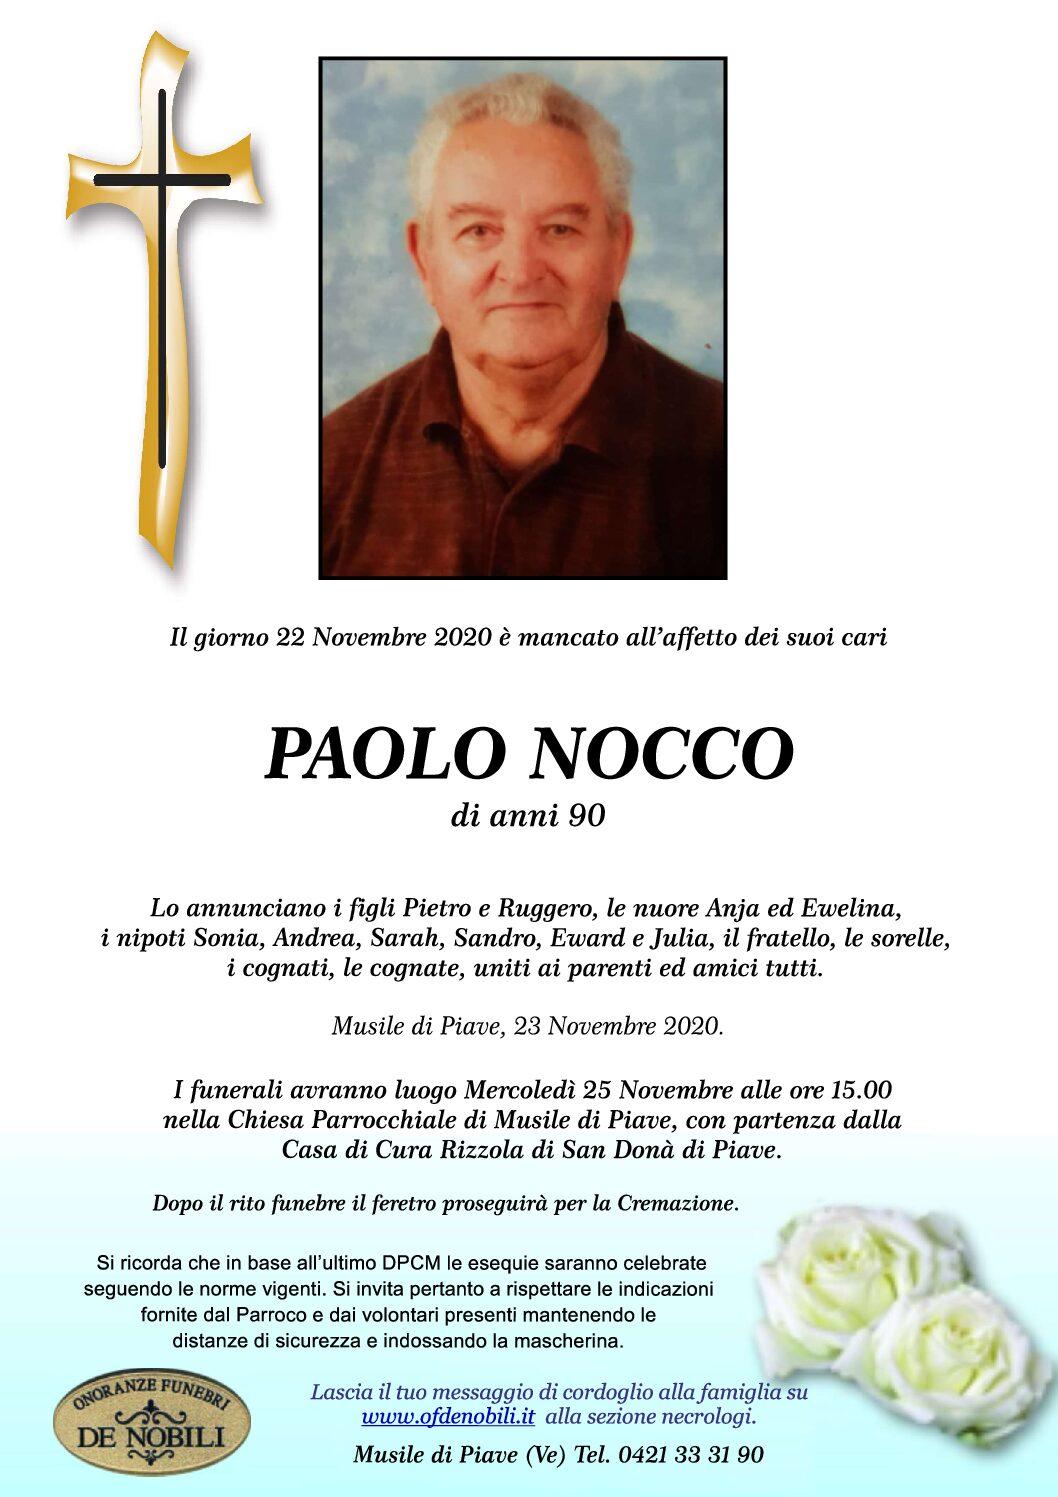 PAOLO NOCCO